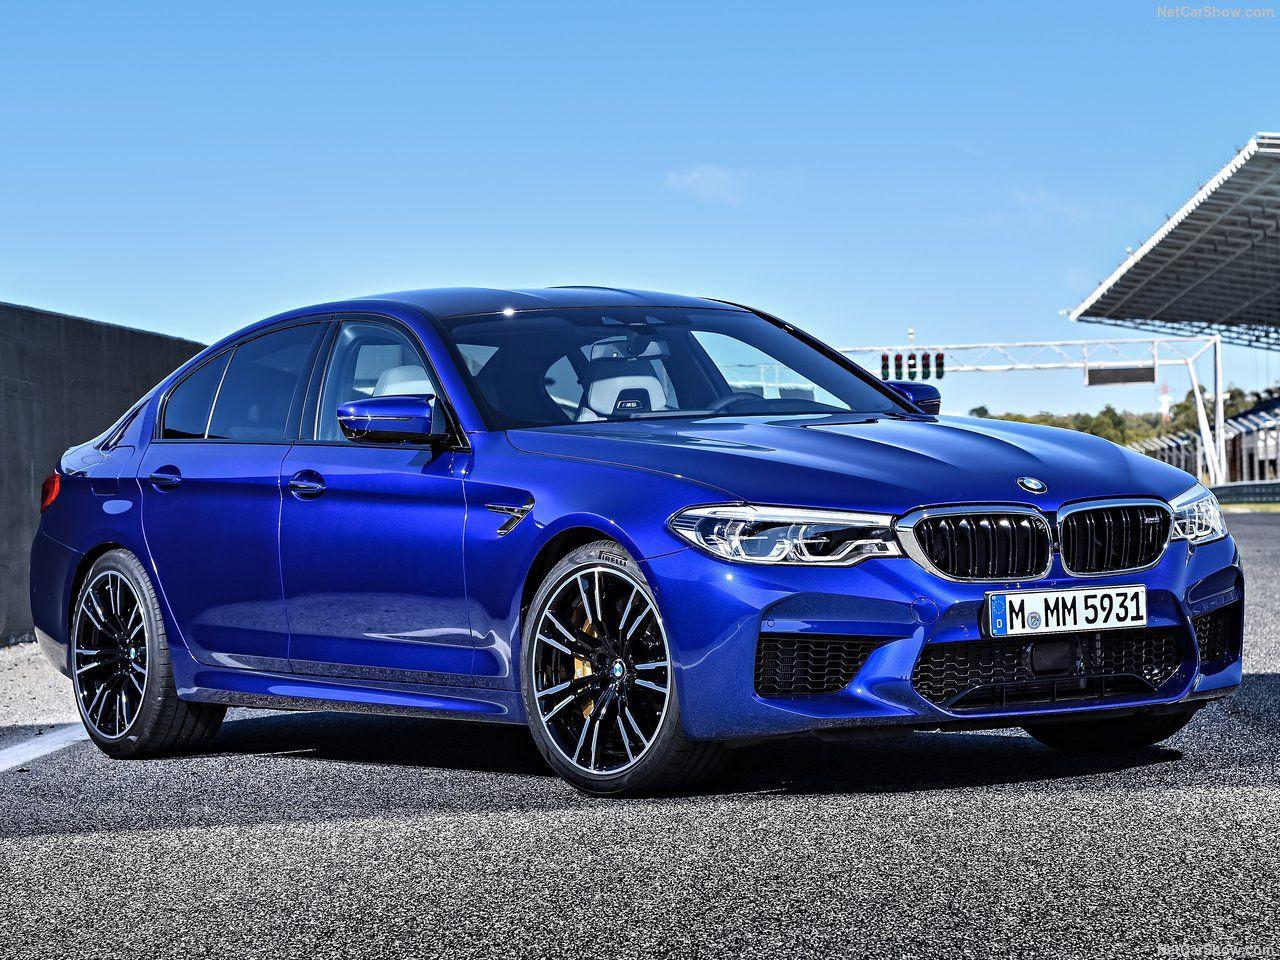 Karşınızda BMW M5 2018 - Page 2